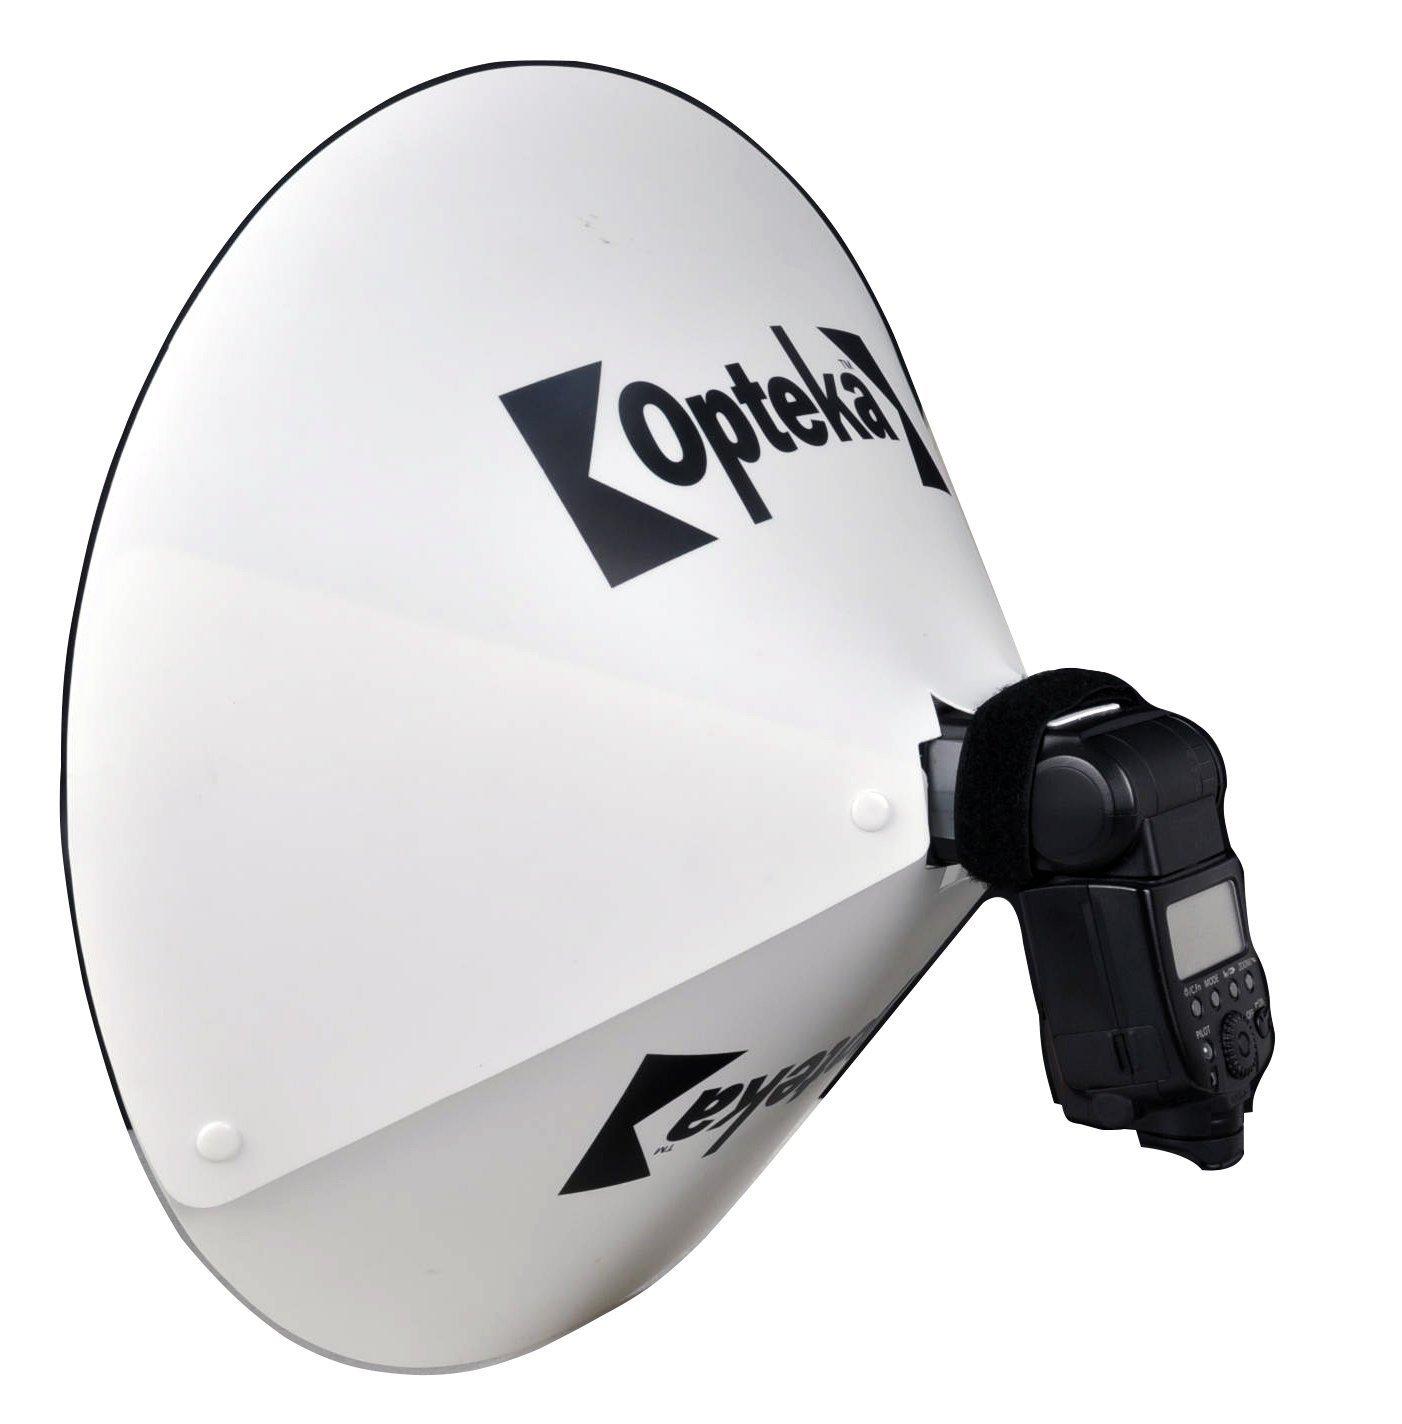 Opteka bd-10 Studio 23-inch DSLRデジタルカメラDishドームフラッシュPortraitシャドウReflector Diffuser切替弁Studioライトfor Olympus FL - 600r FL - 50r fl-600 FL - 50 fl600 fl50 B00JKQYQ6E